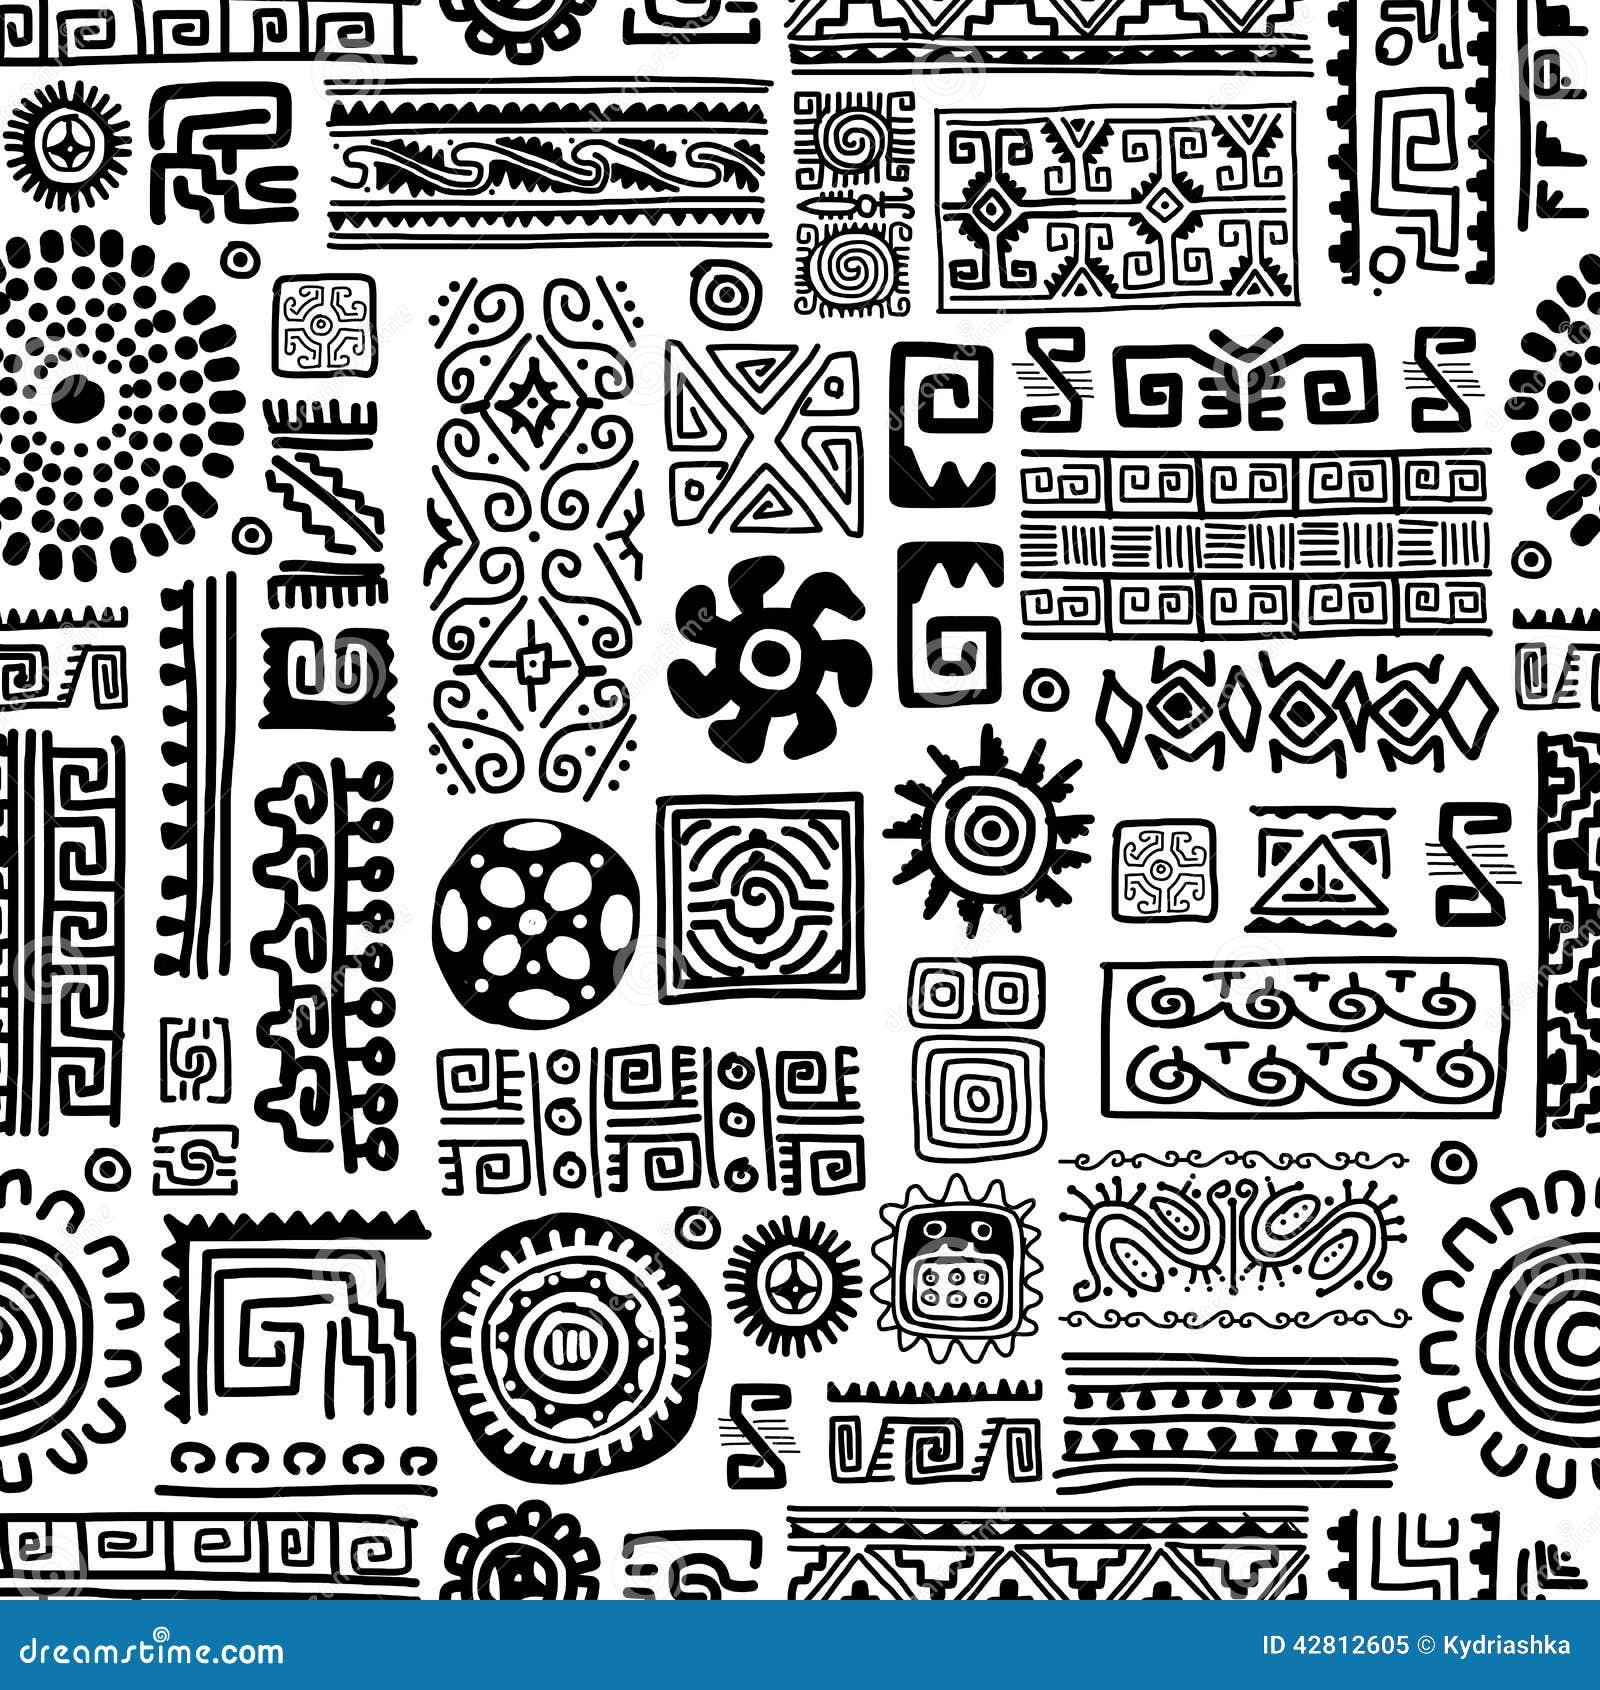 Ethnic handmade ornament, seamless pattern for